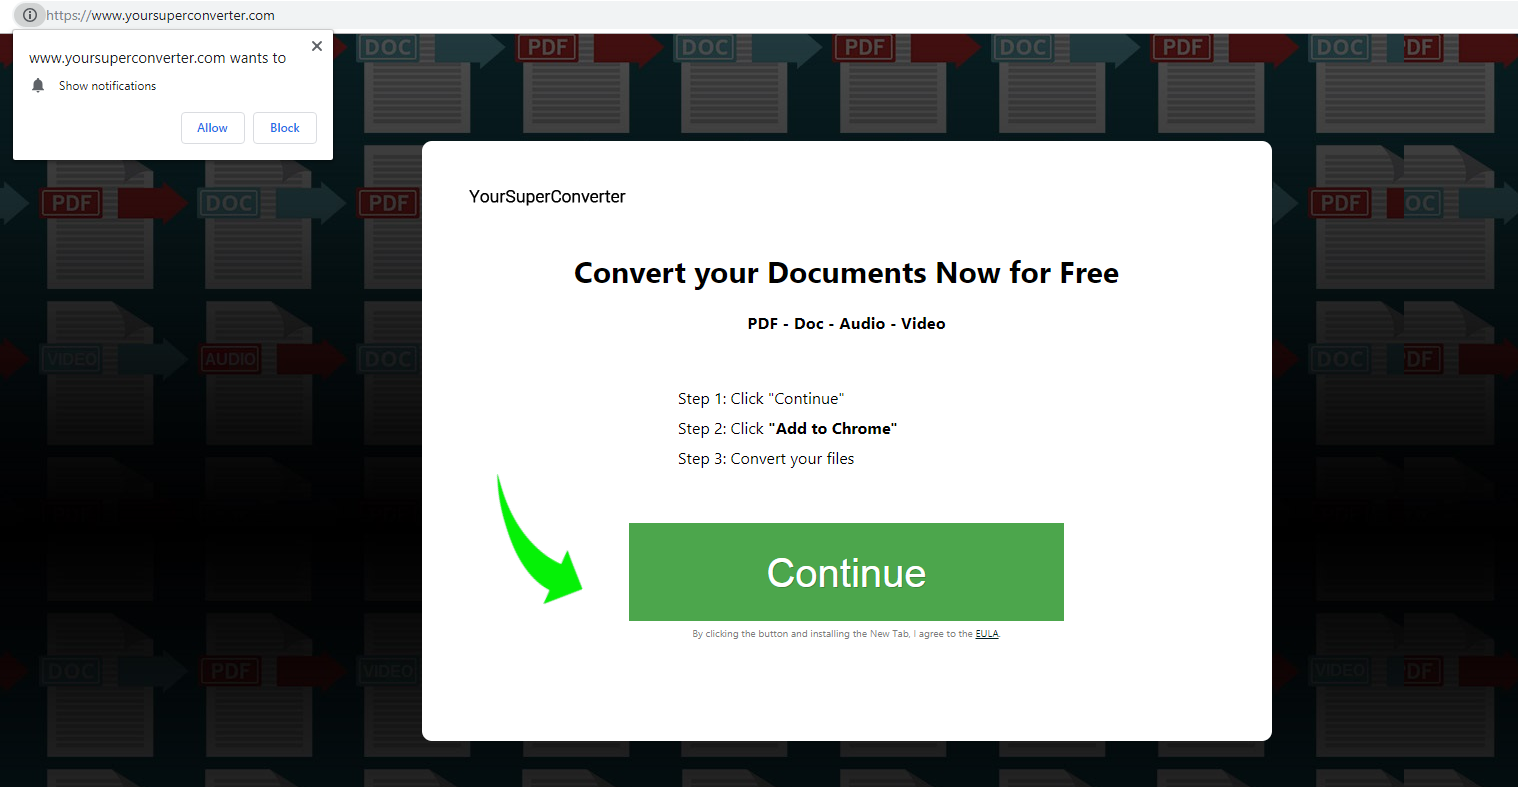 YourSuperConverter adware